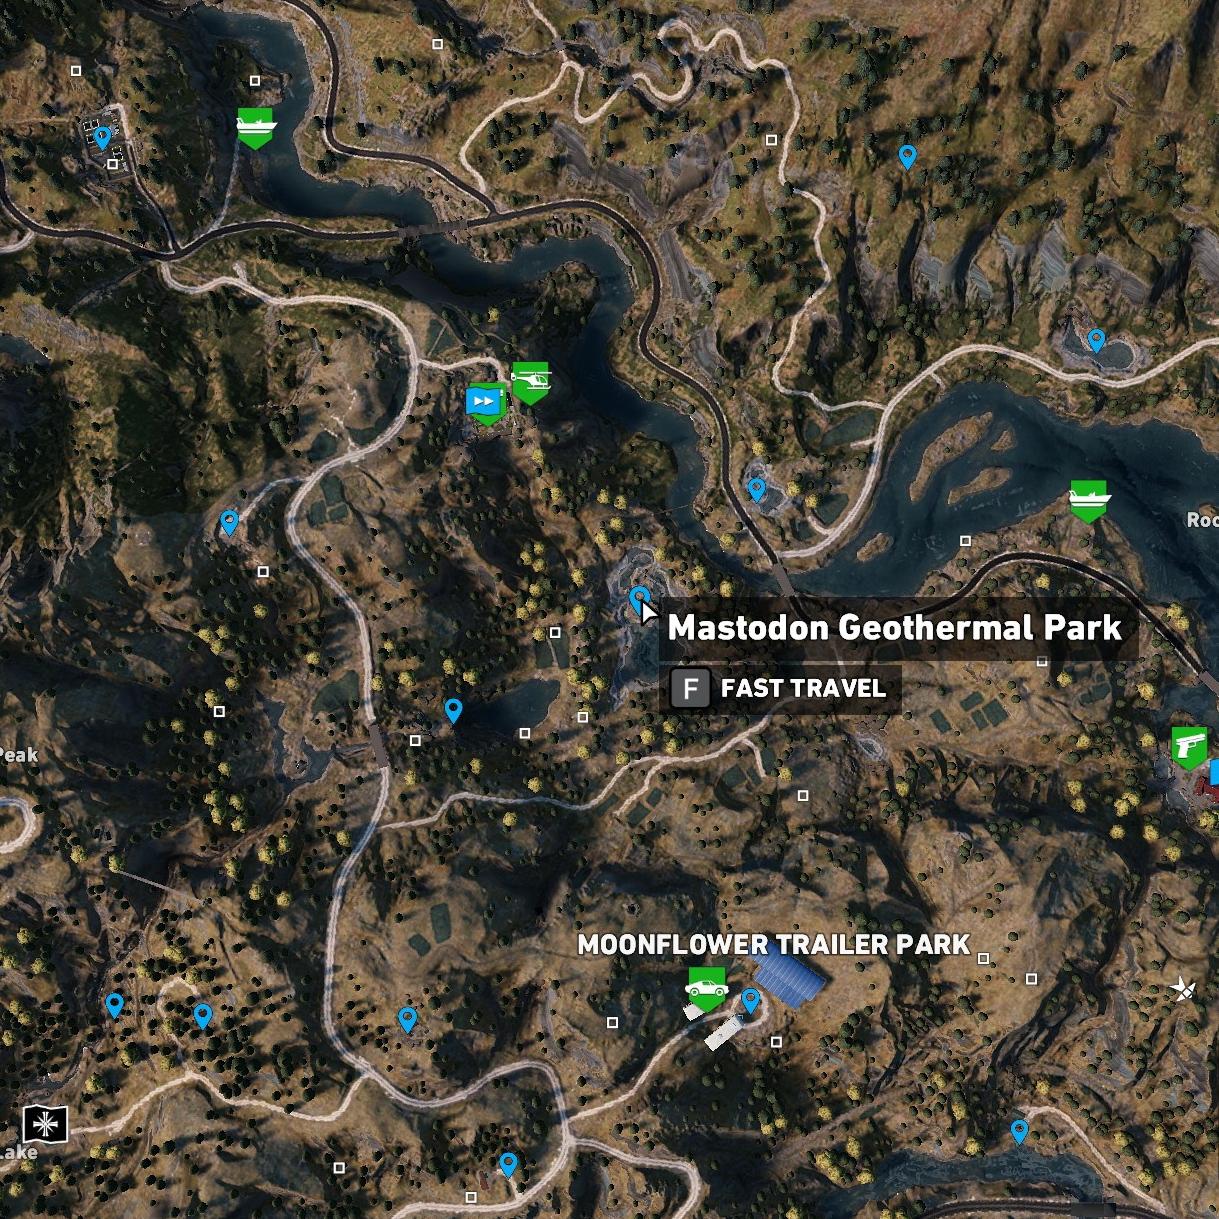 Mastodon Geothermal Park